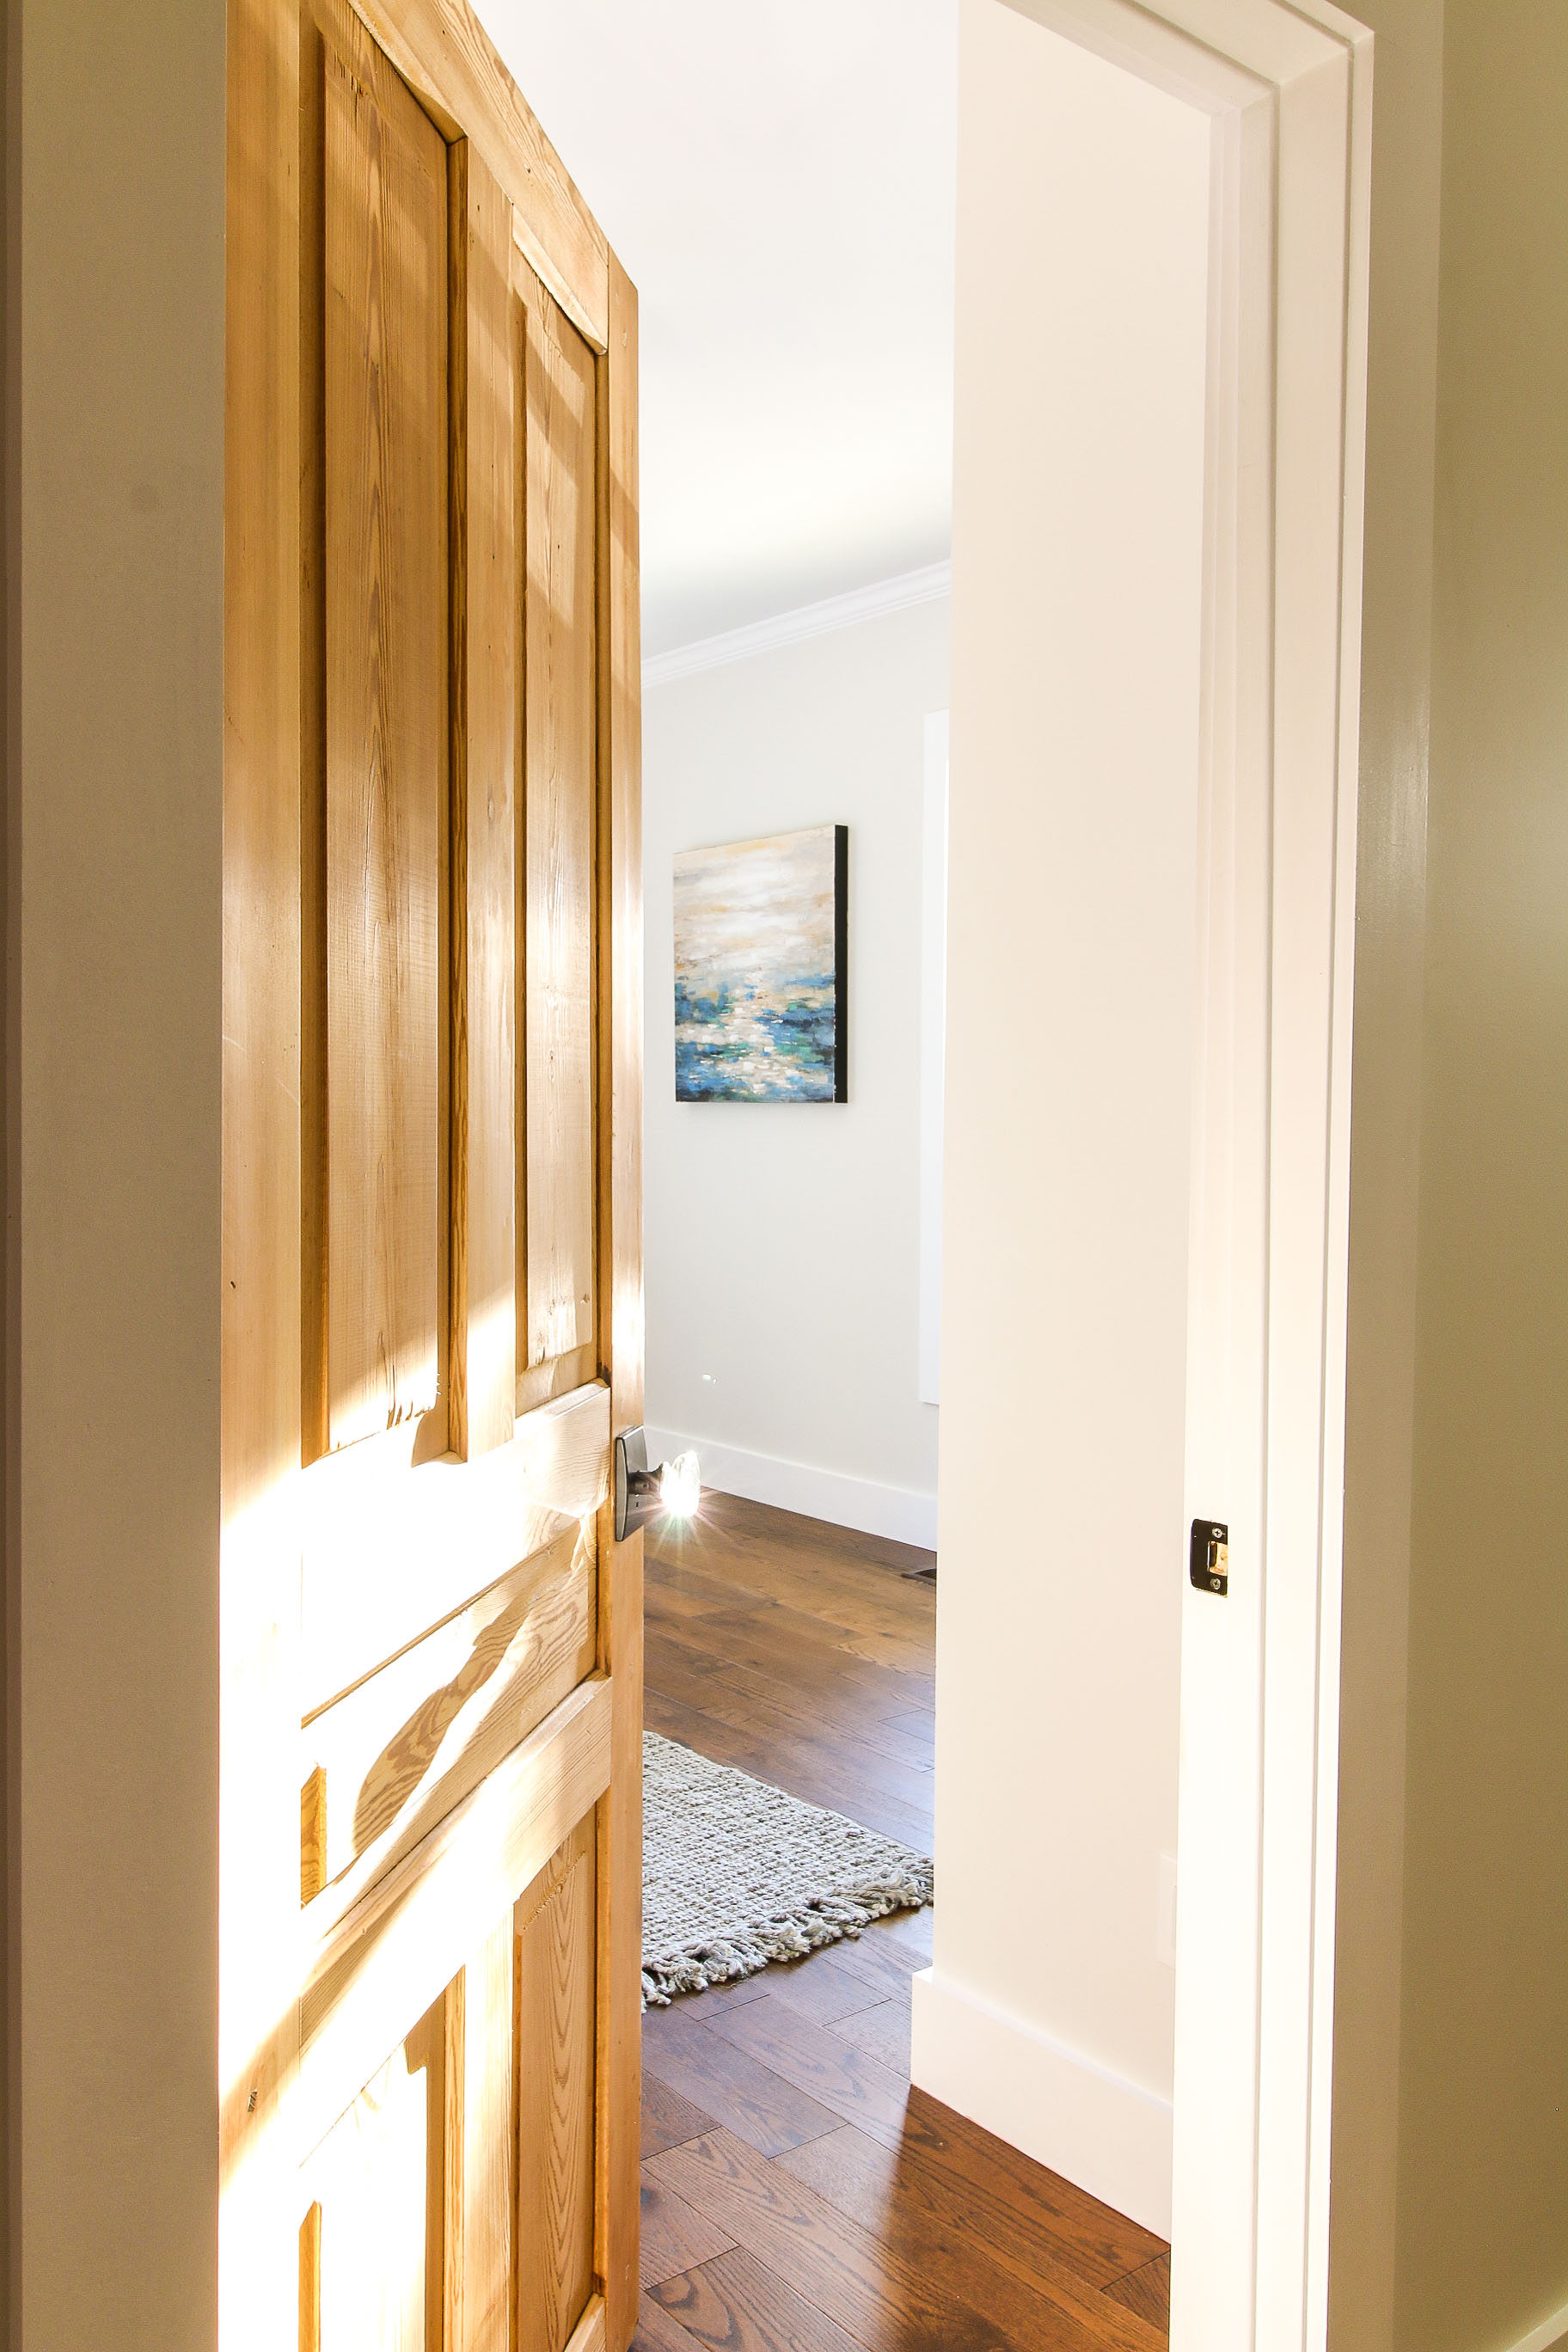 Door opening with ocean painting showing. Glass door knob with sun glinting on it.